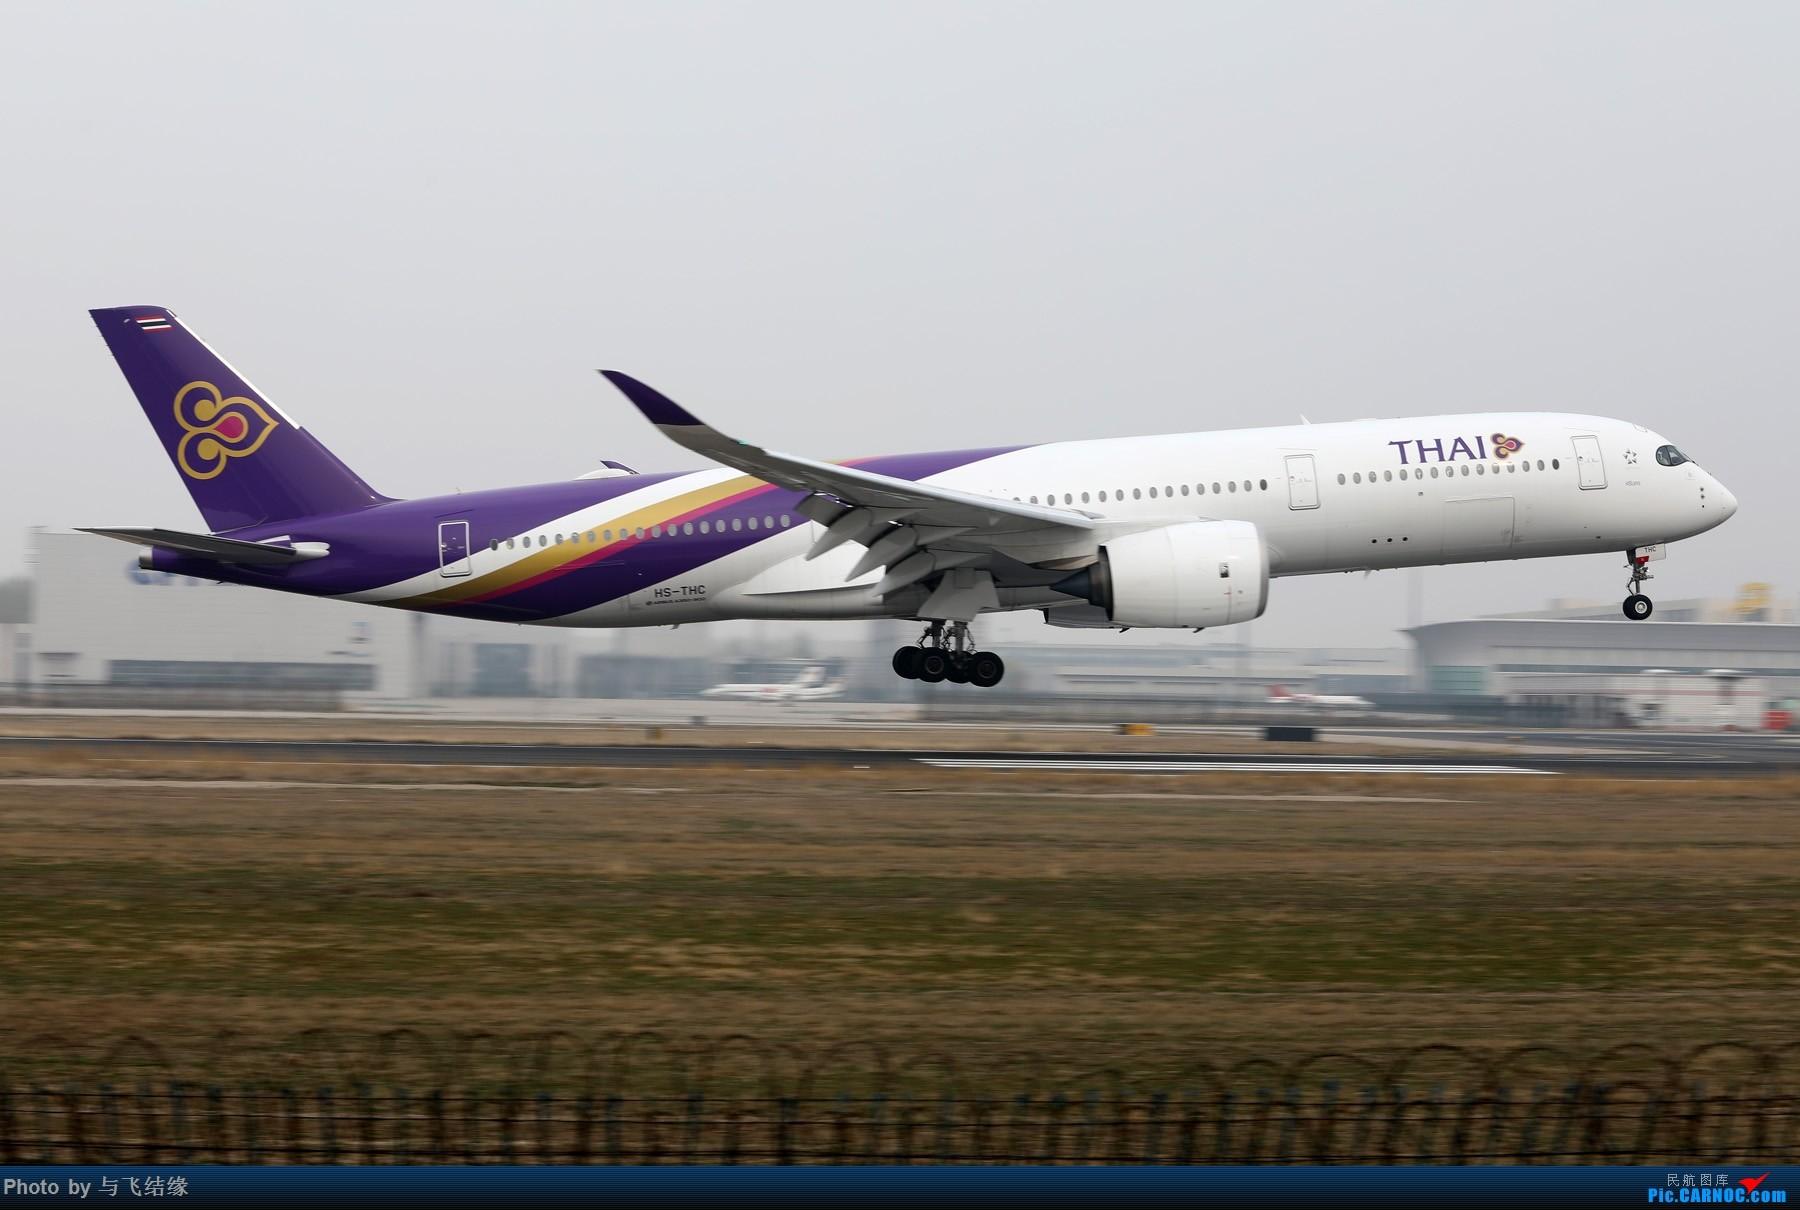 Re:[原创]在PEK的Airbus A350-900(部分) AIRBUS A350-900 HS-THA 中国北京首都国际机场